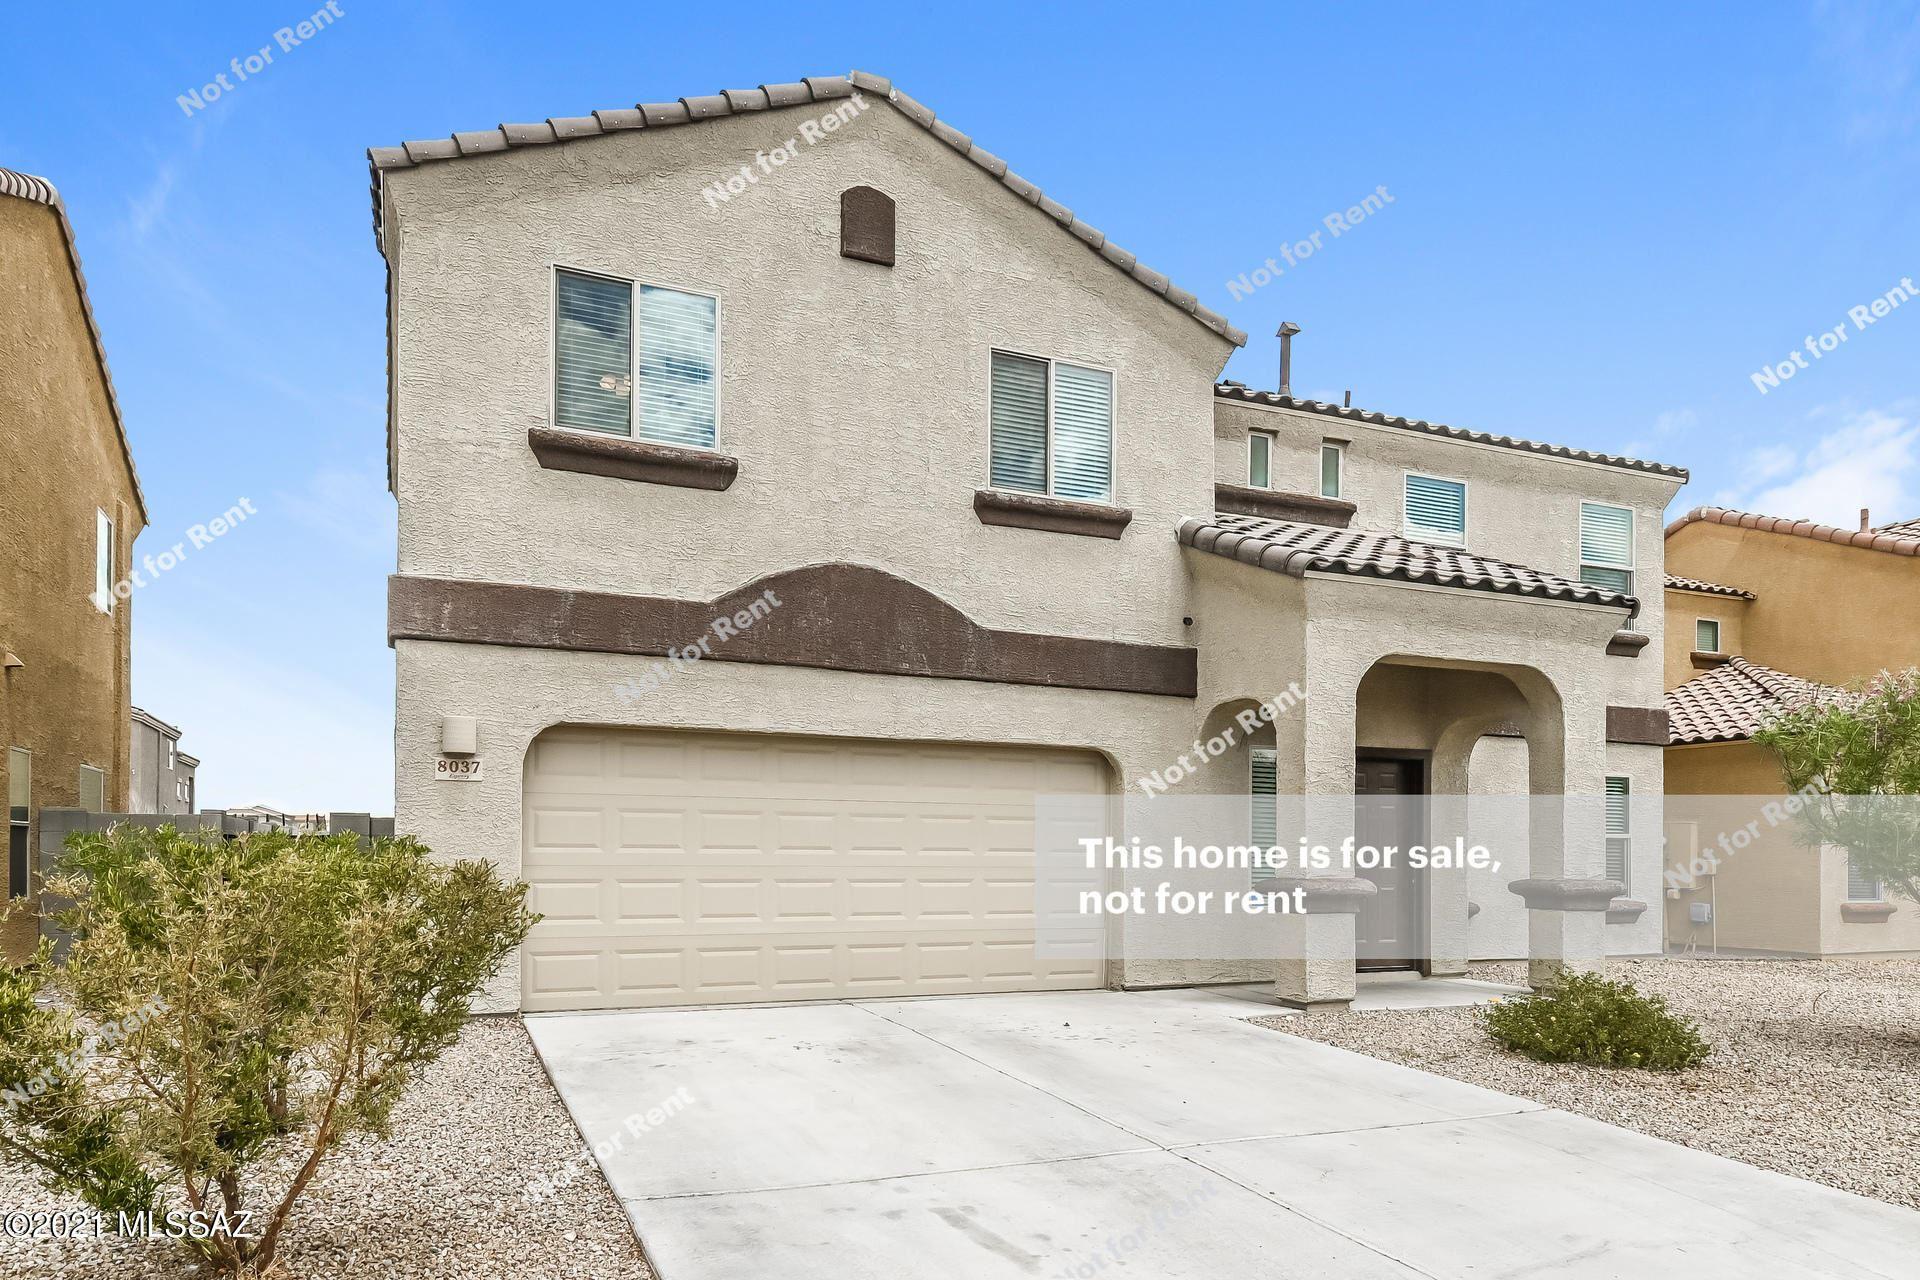 8037 S Red Sox Road, Tucson, AZ 85756 - MLS#: 22116954